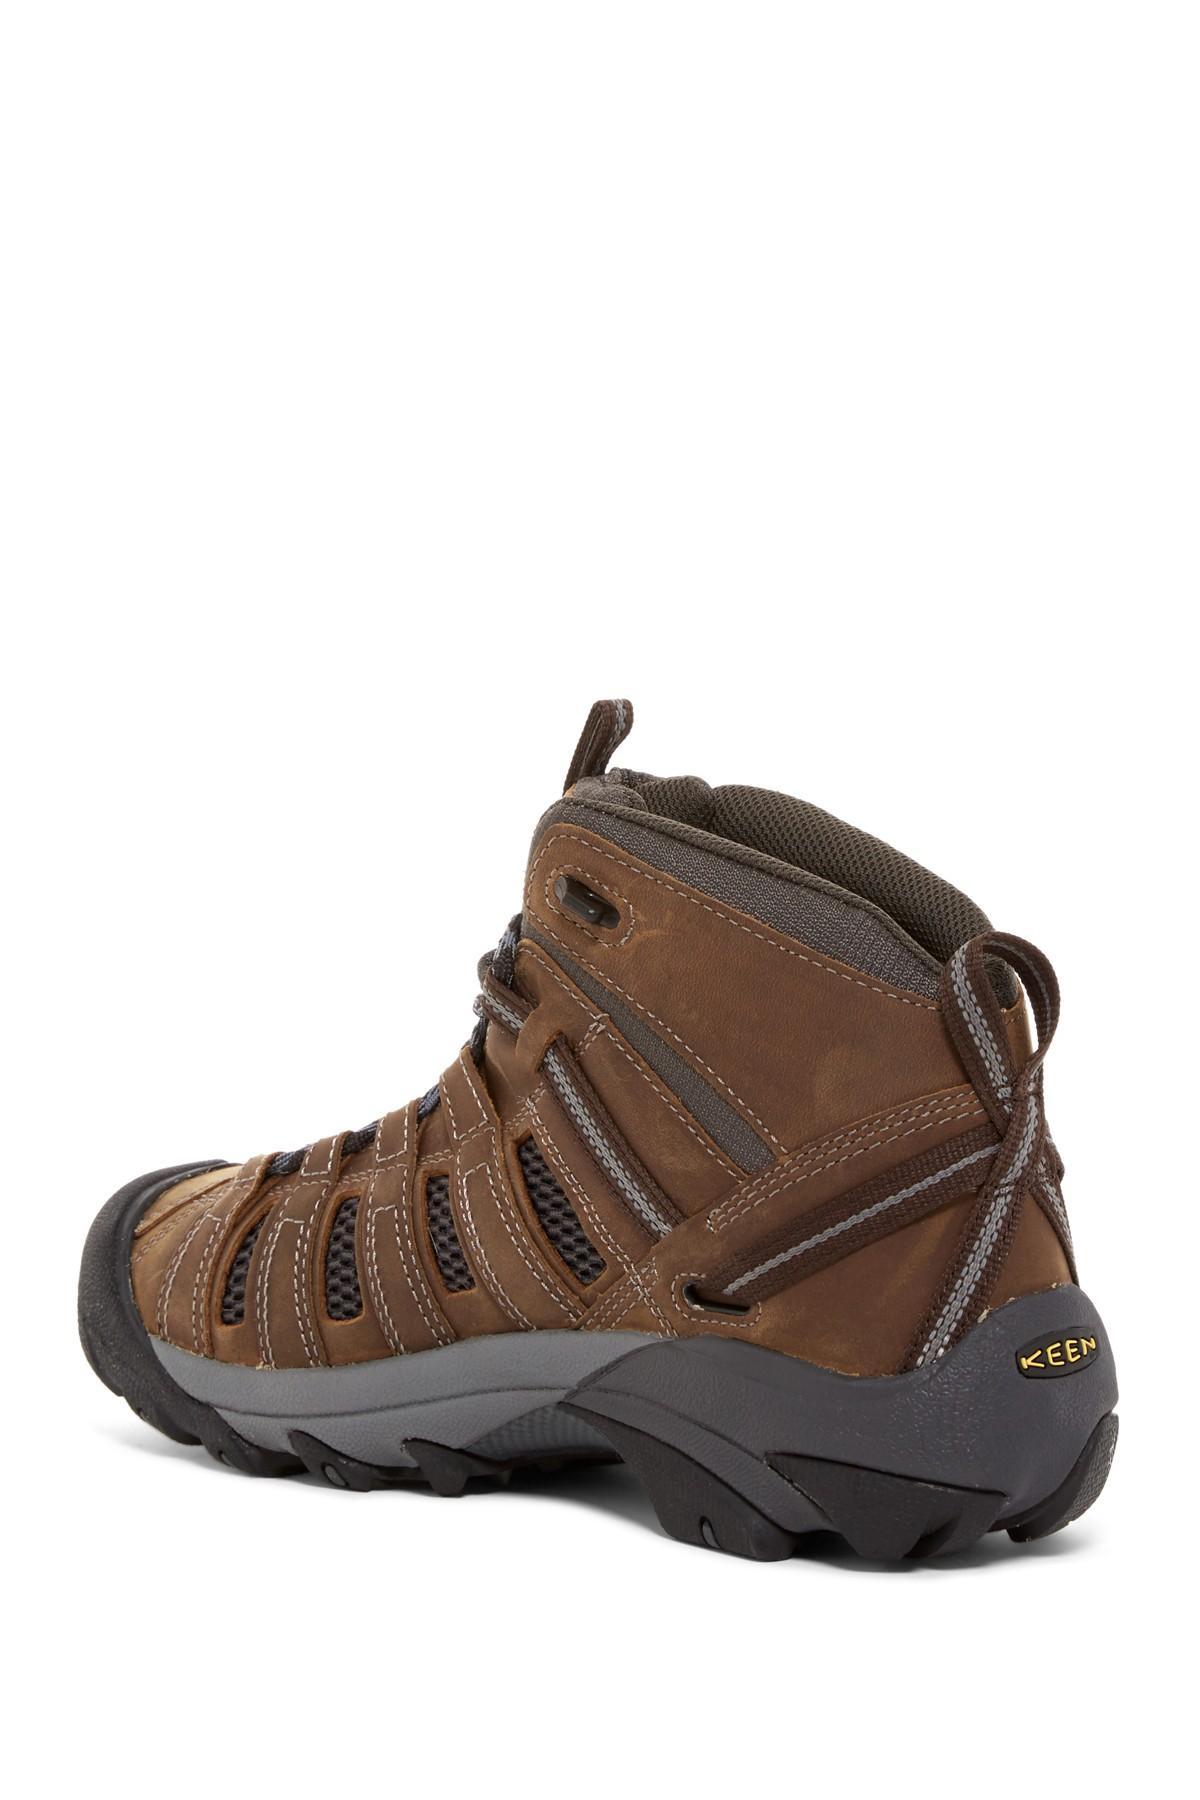 Keen Brown Chukka Shoes